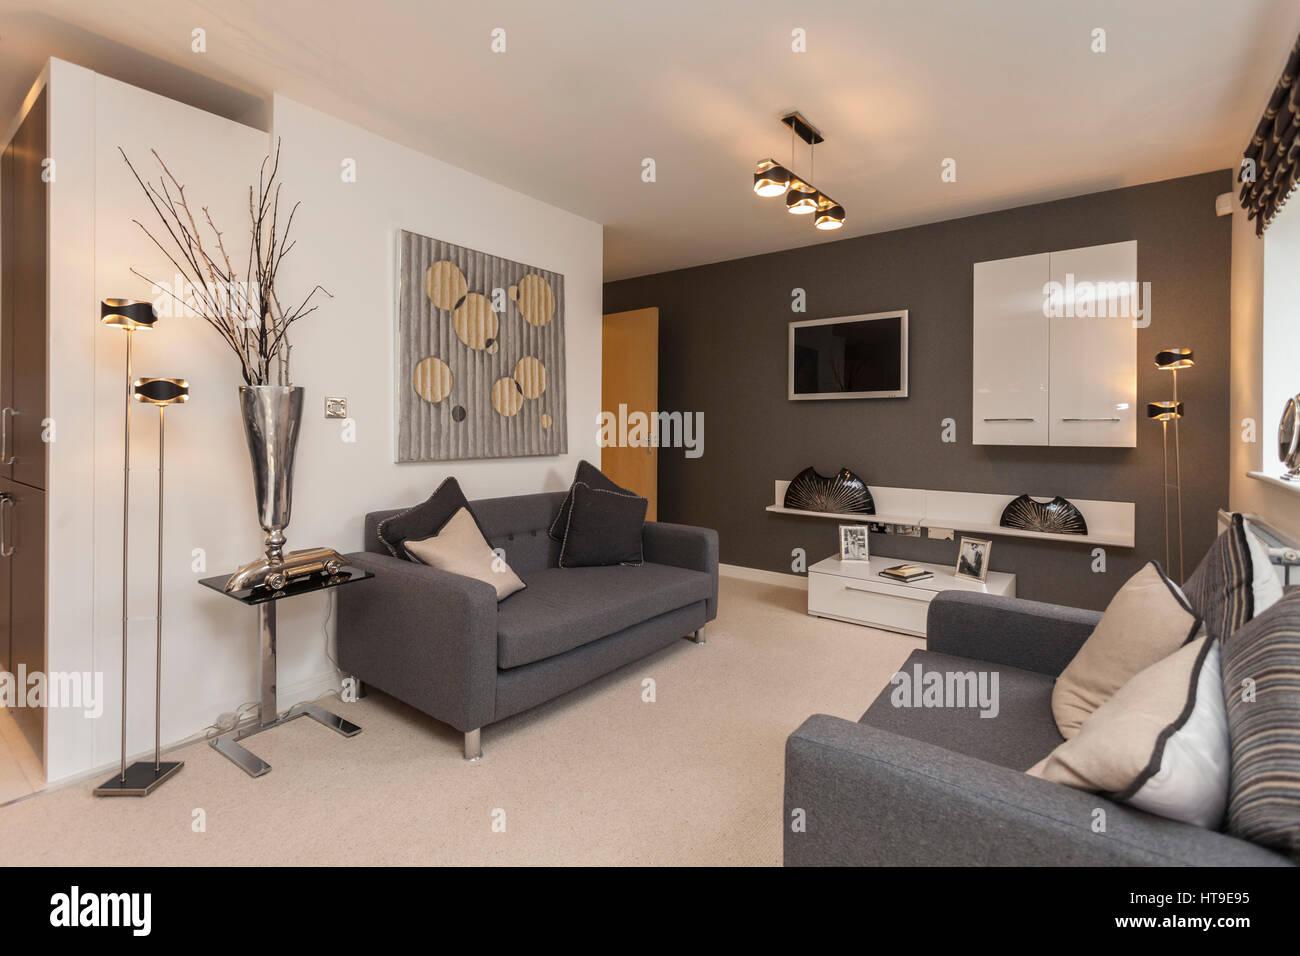 Wohngebäude Moderne Lounge Neubau Grau Sofa Teppich Creme